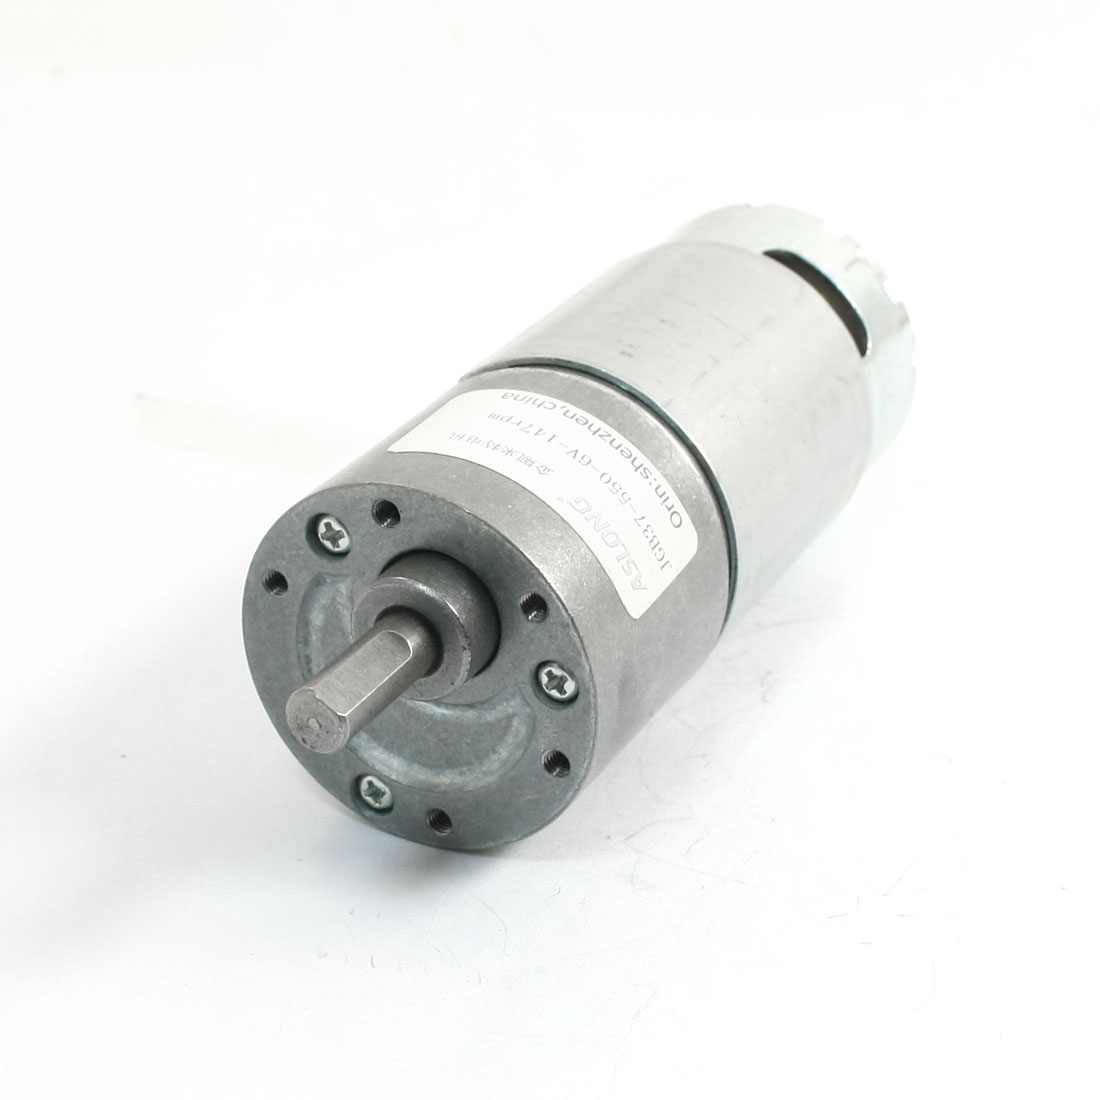 JGB37-550 Permanent Magnetic DC Geared Motor 6V 147RPM 0.8A 10kg.cm